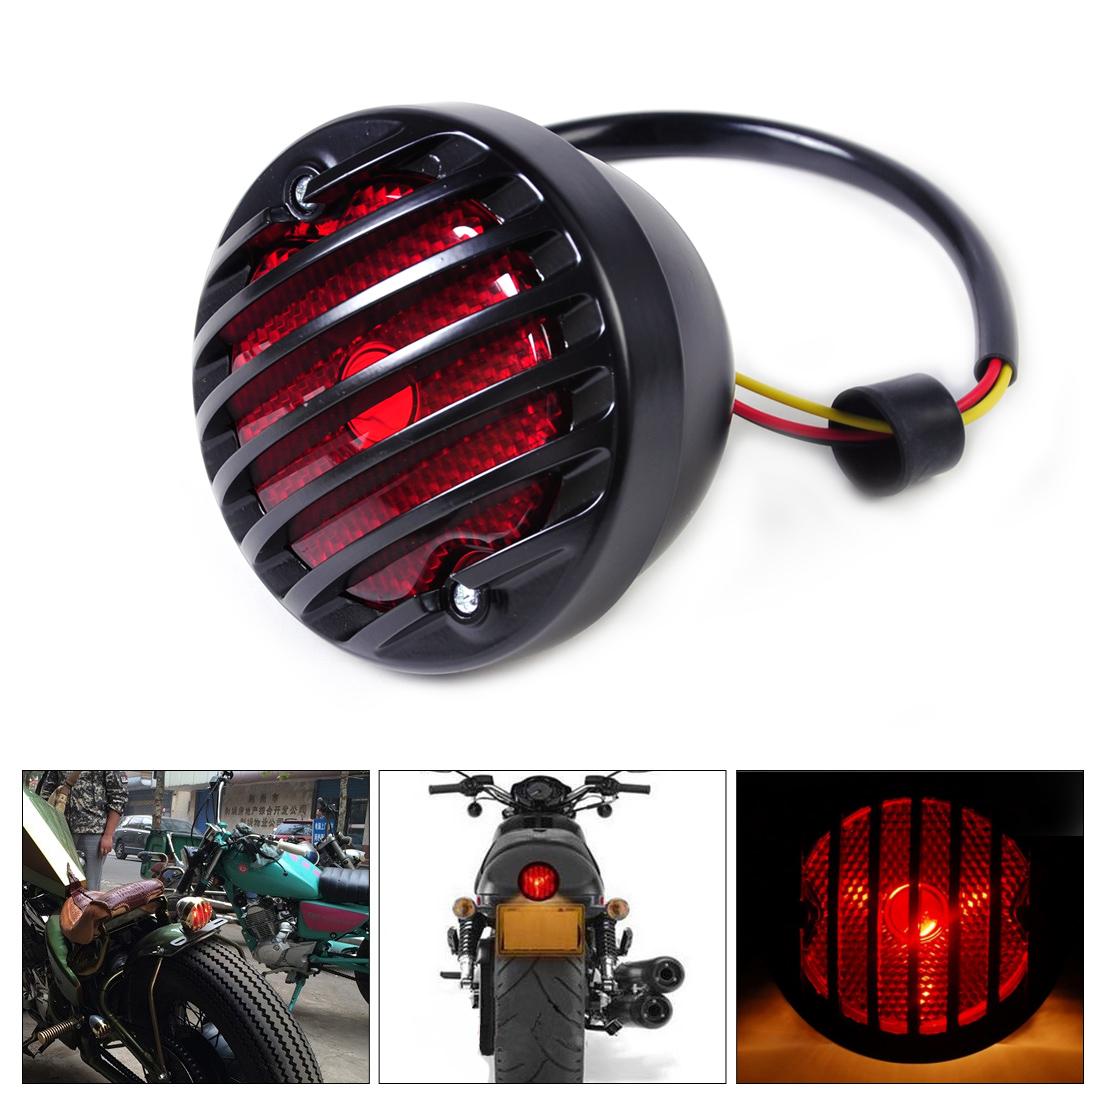 DWCX Motorcycle Ribbed Round Tail Brake Light Lamp for Harley BMW Honda Suzuki Yamaha Kawasaki Custom Bobber Chopper Scooters